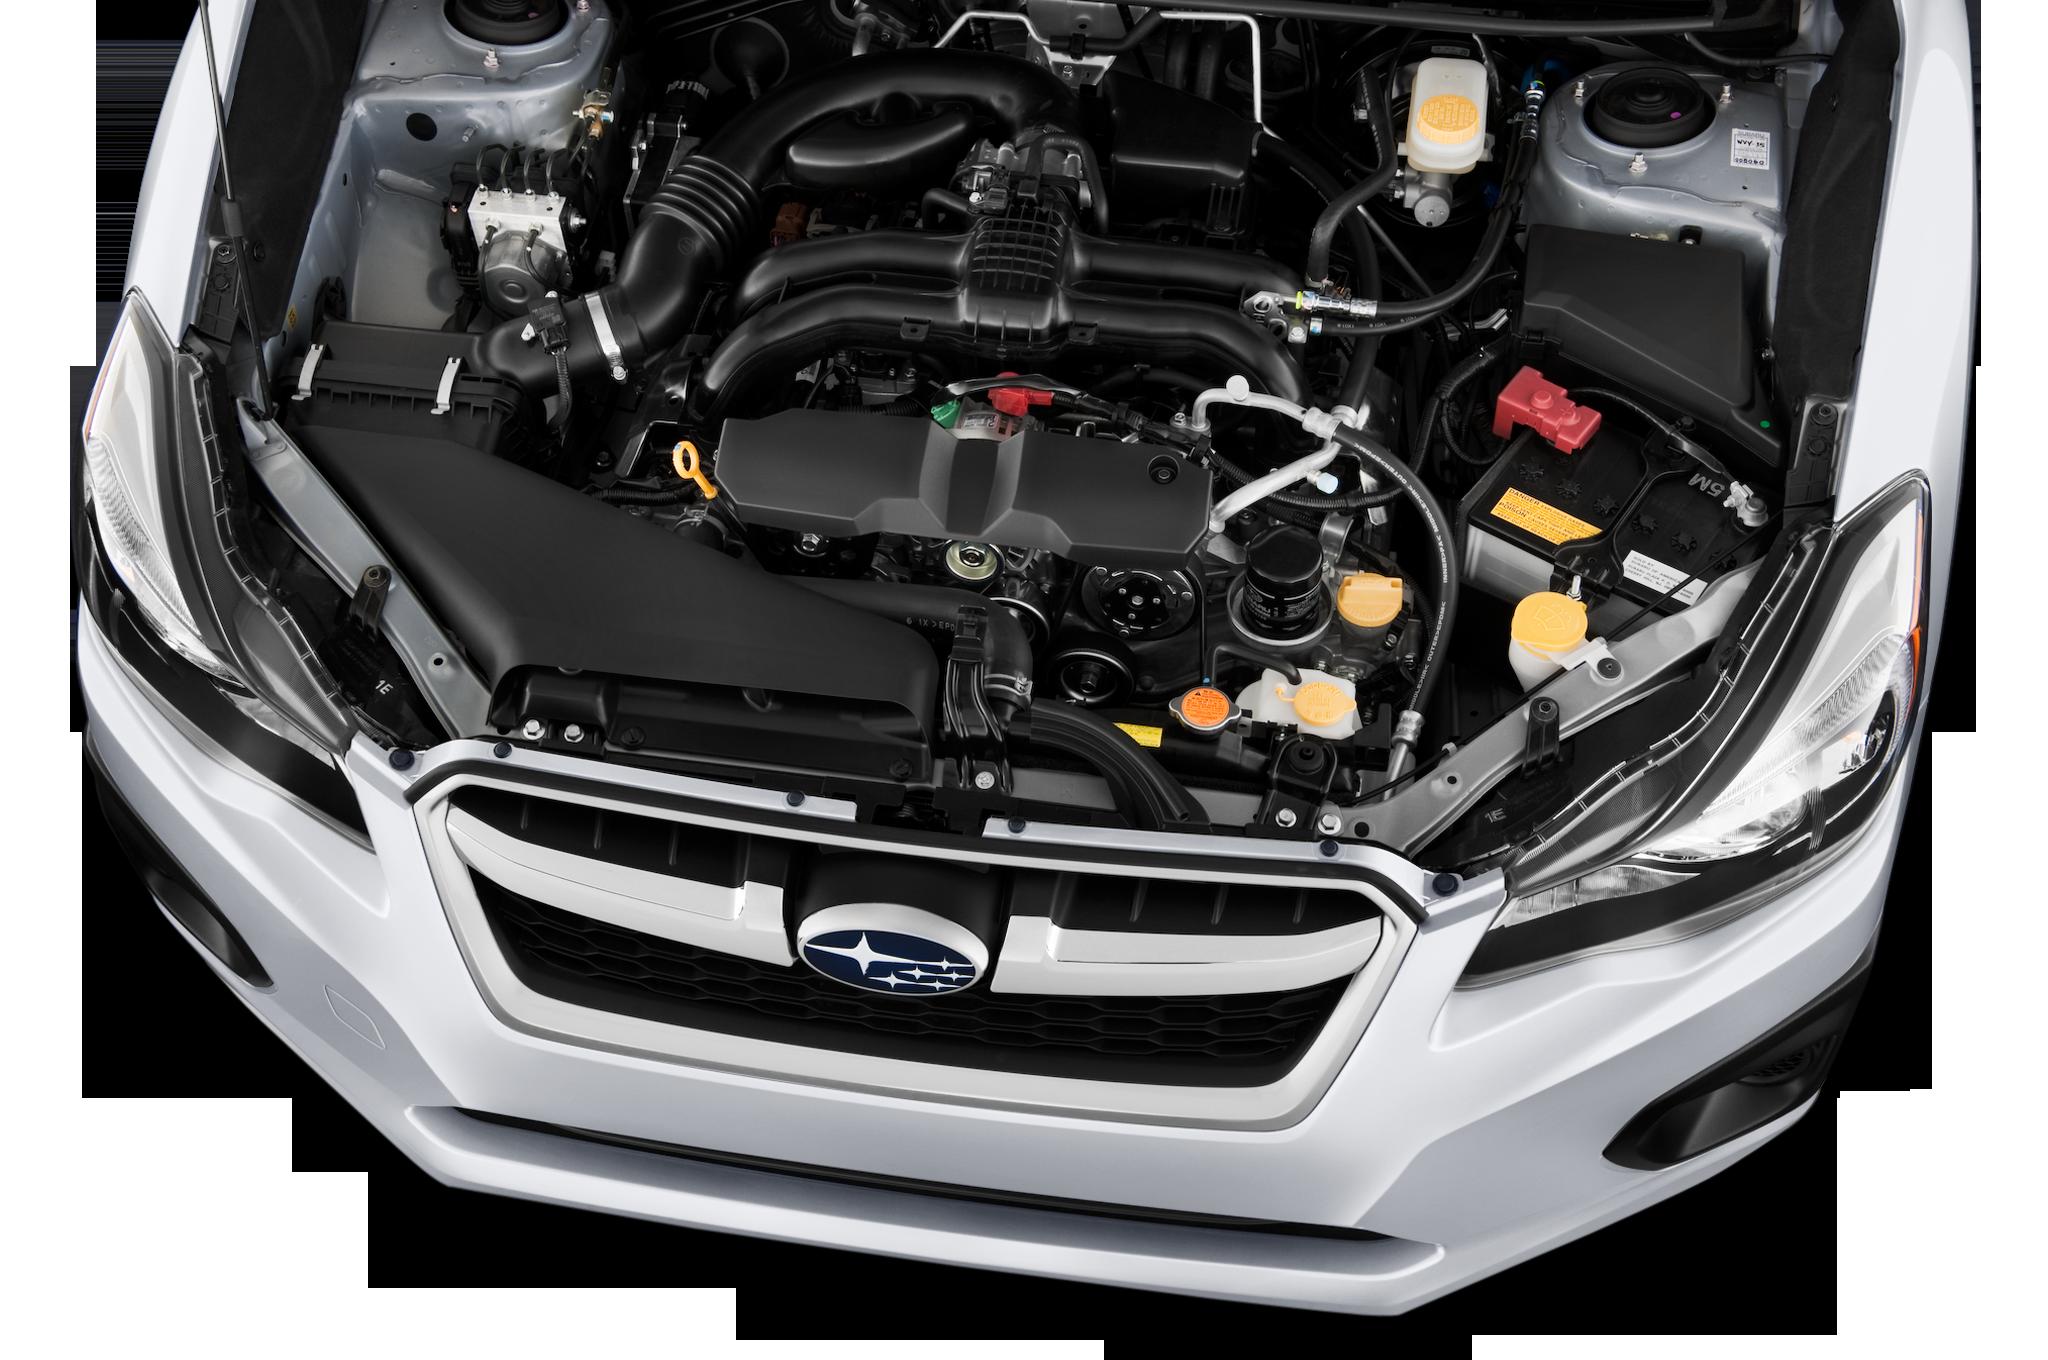 2012 Subaru Impreza Engine Diagram Just Another Wiring Blog Outback 2 0i Diagrams Source Rh 9 6 Ludwiglab De 2001